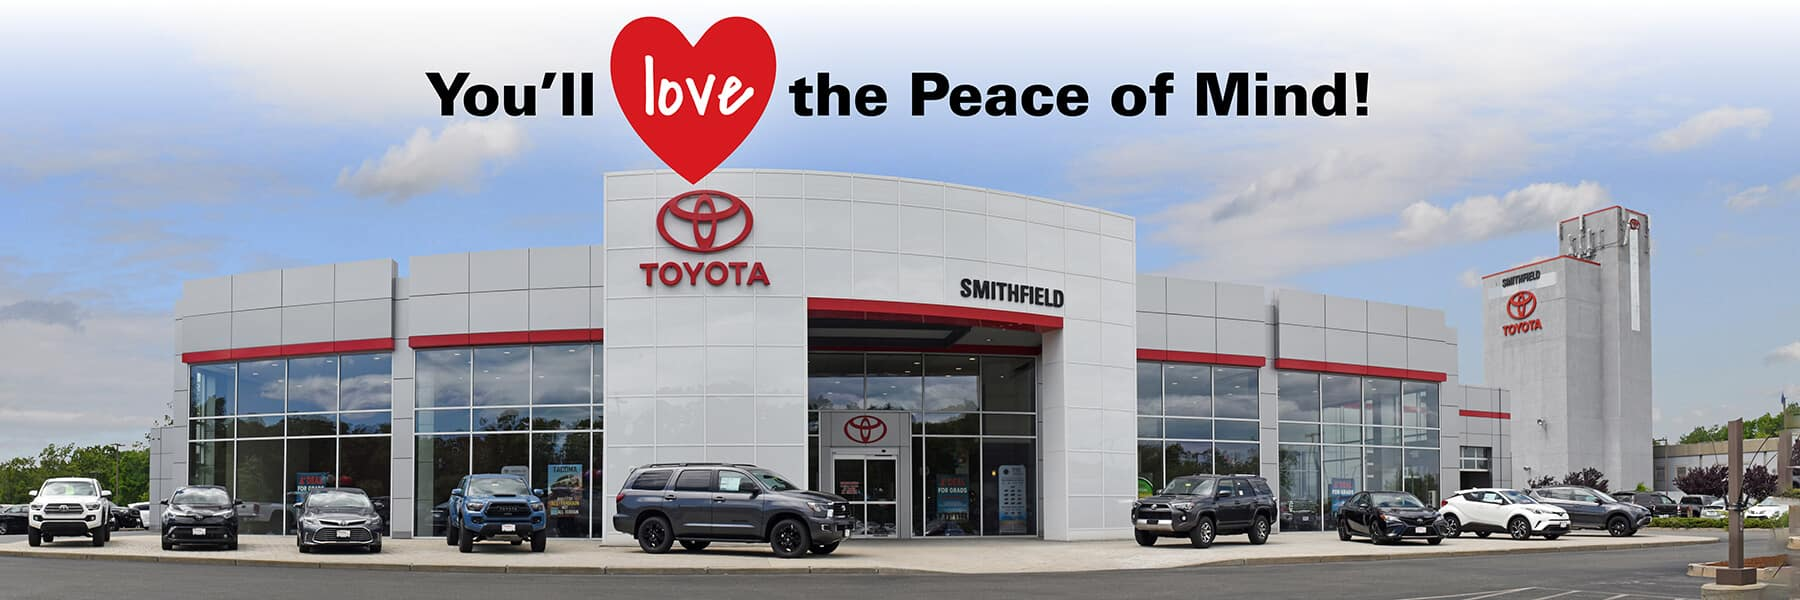 Toyota Of Smithfield Toyota Dealer In Smithfield Ri